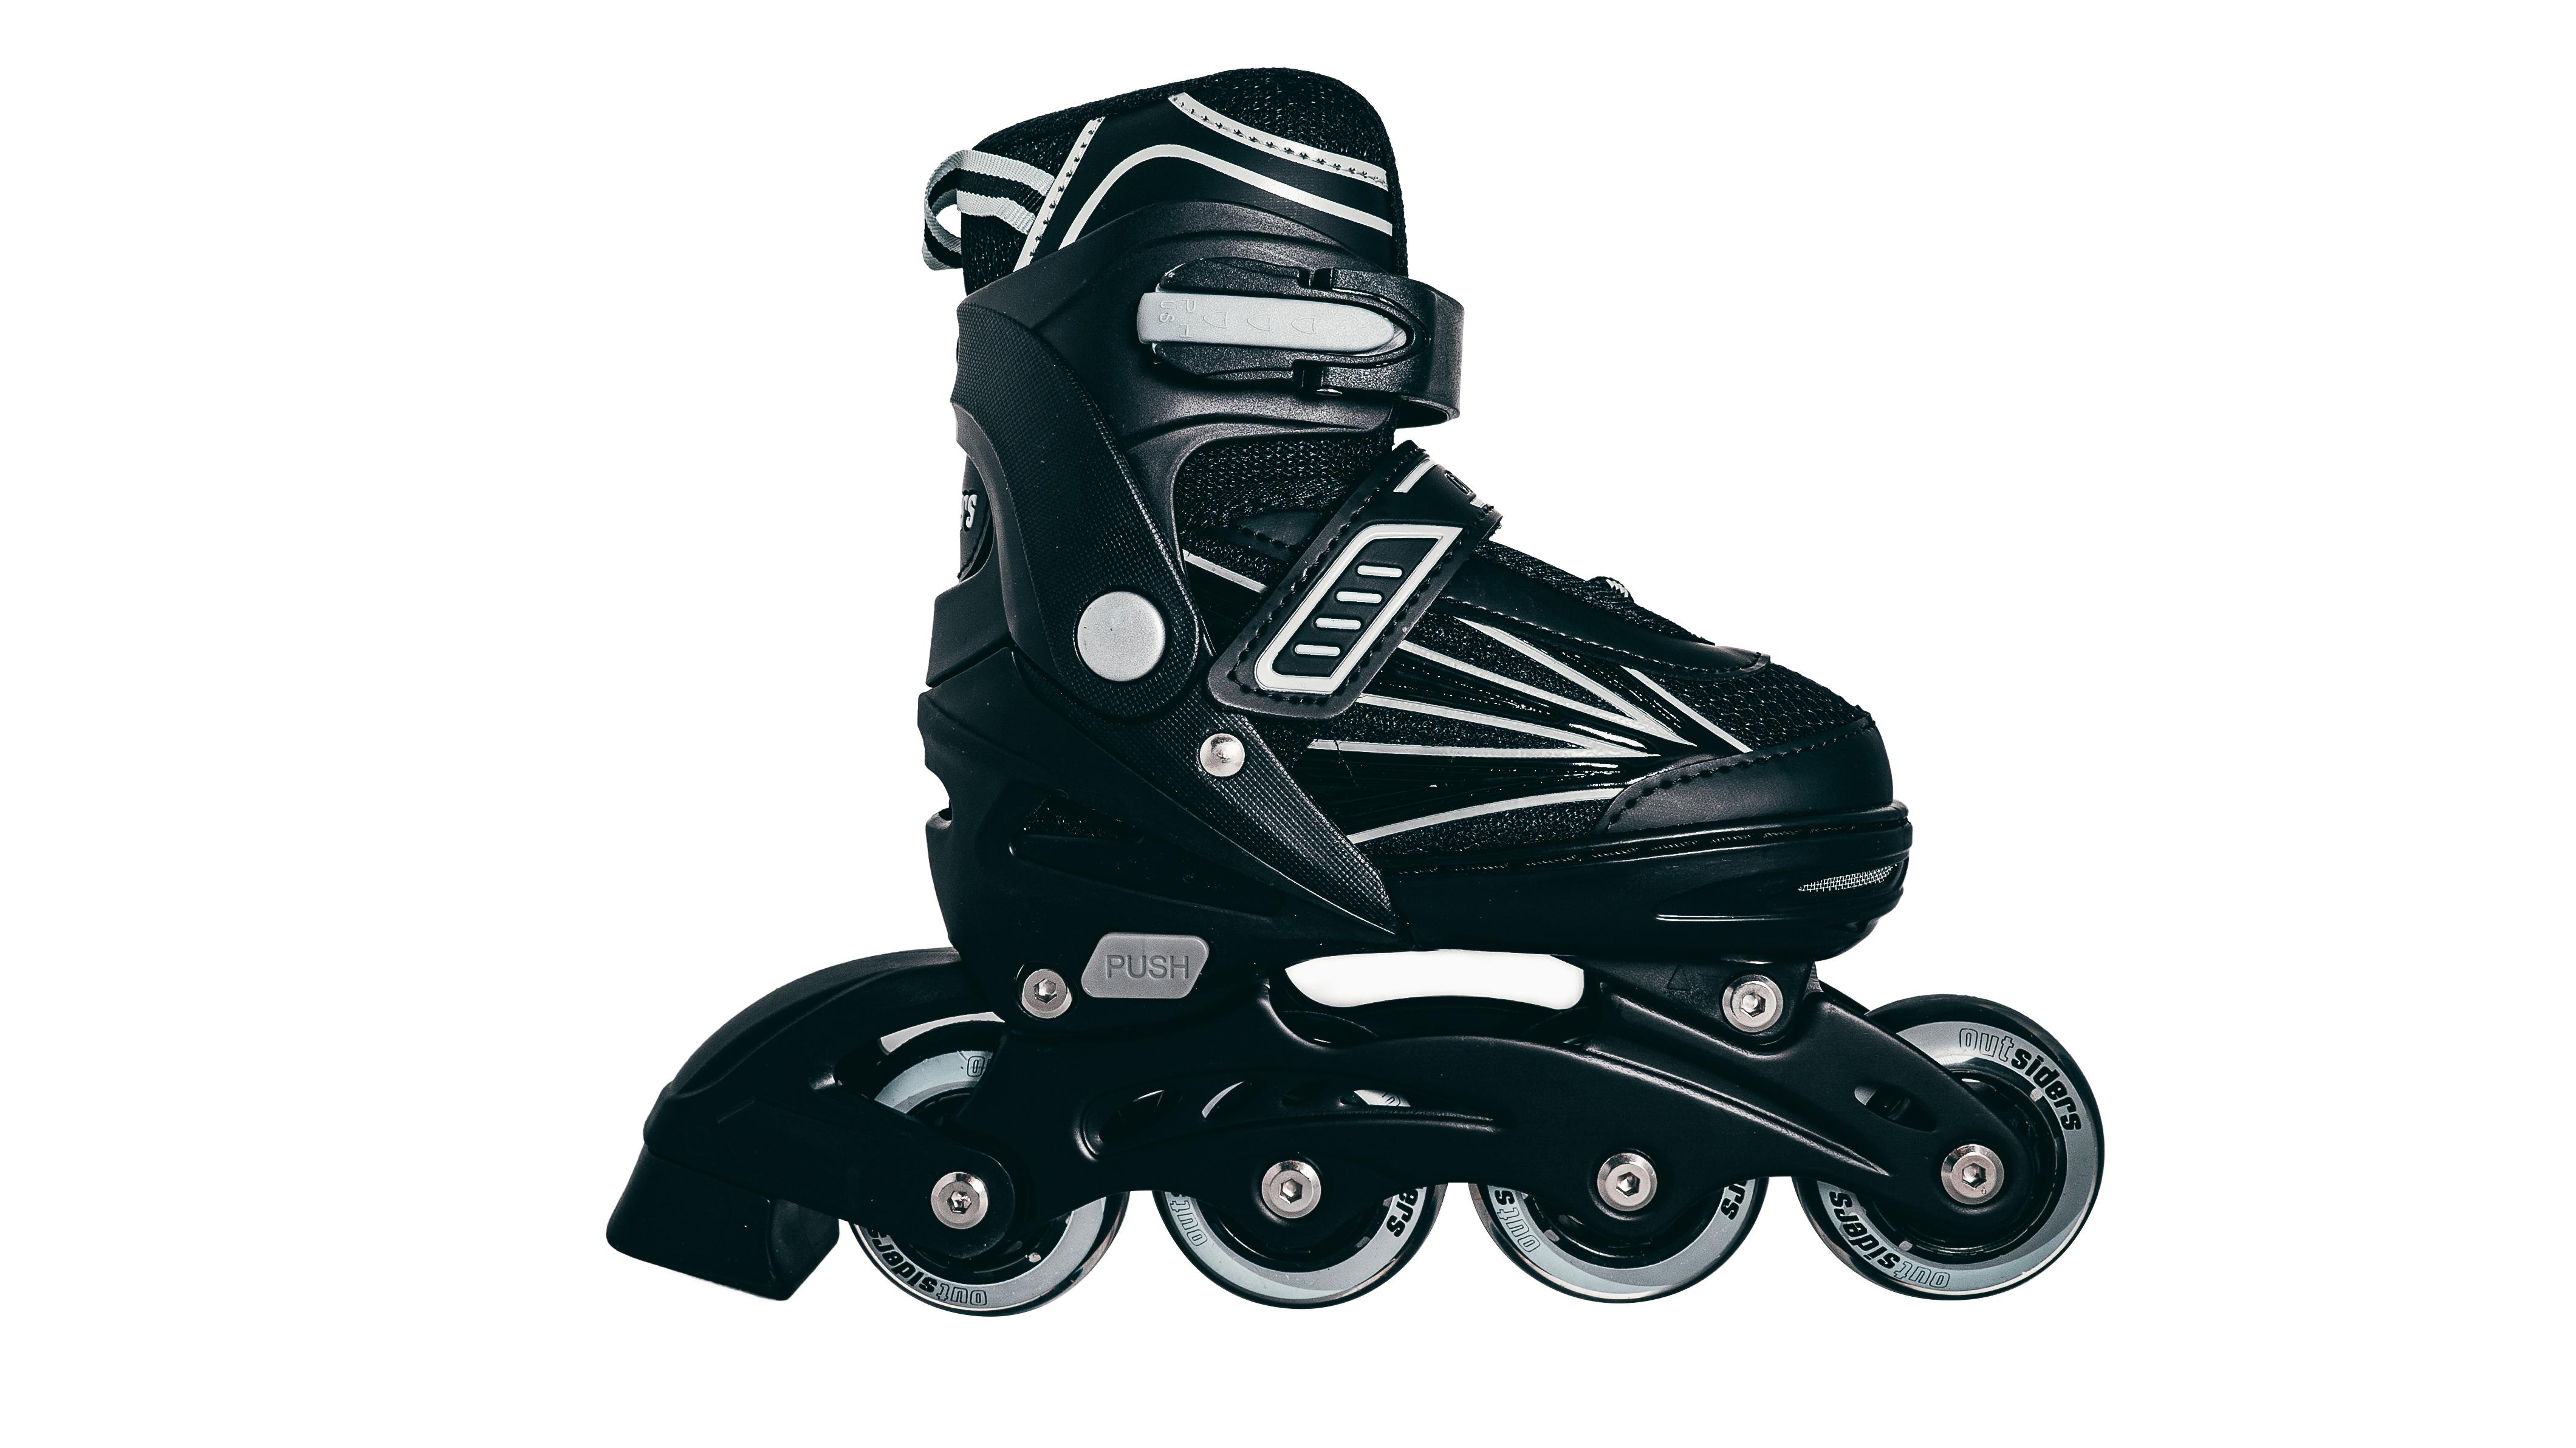 Outsiders - Adjustable Kids Inline Rollerblades - Black/Grey (size: 31-34)